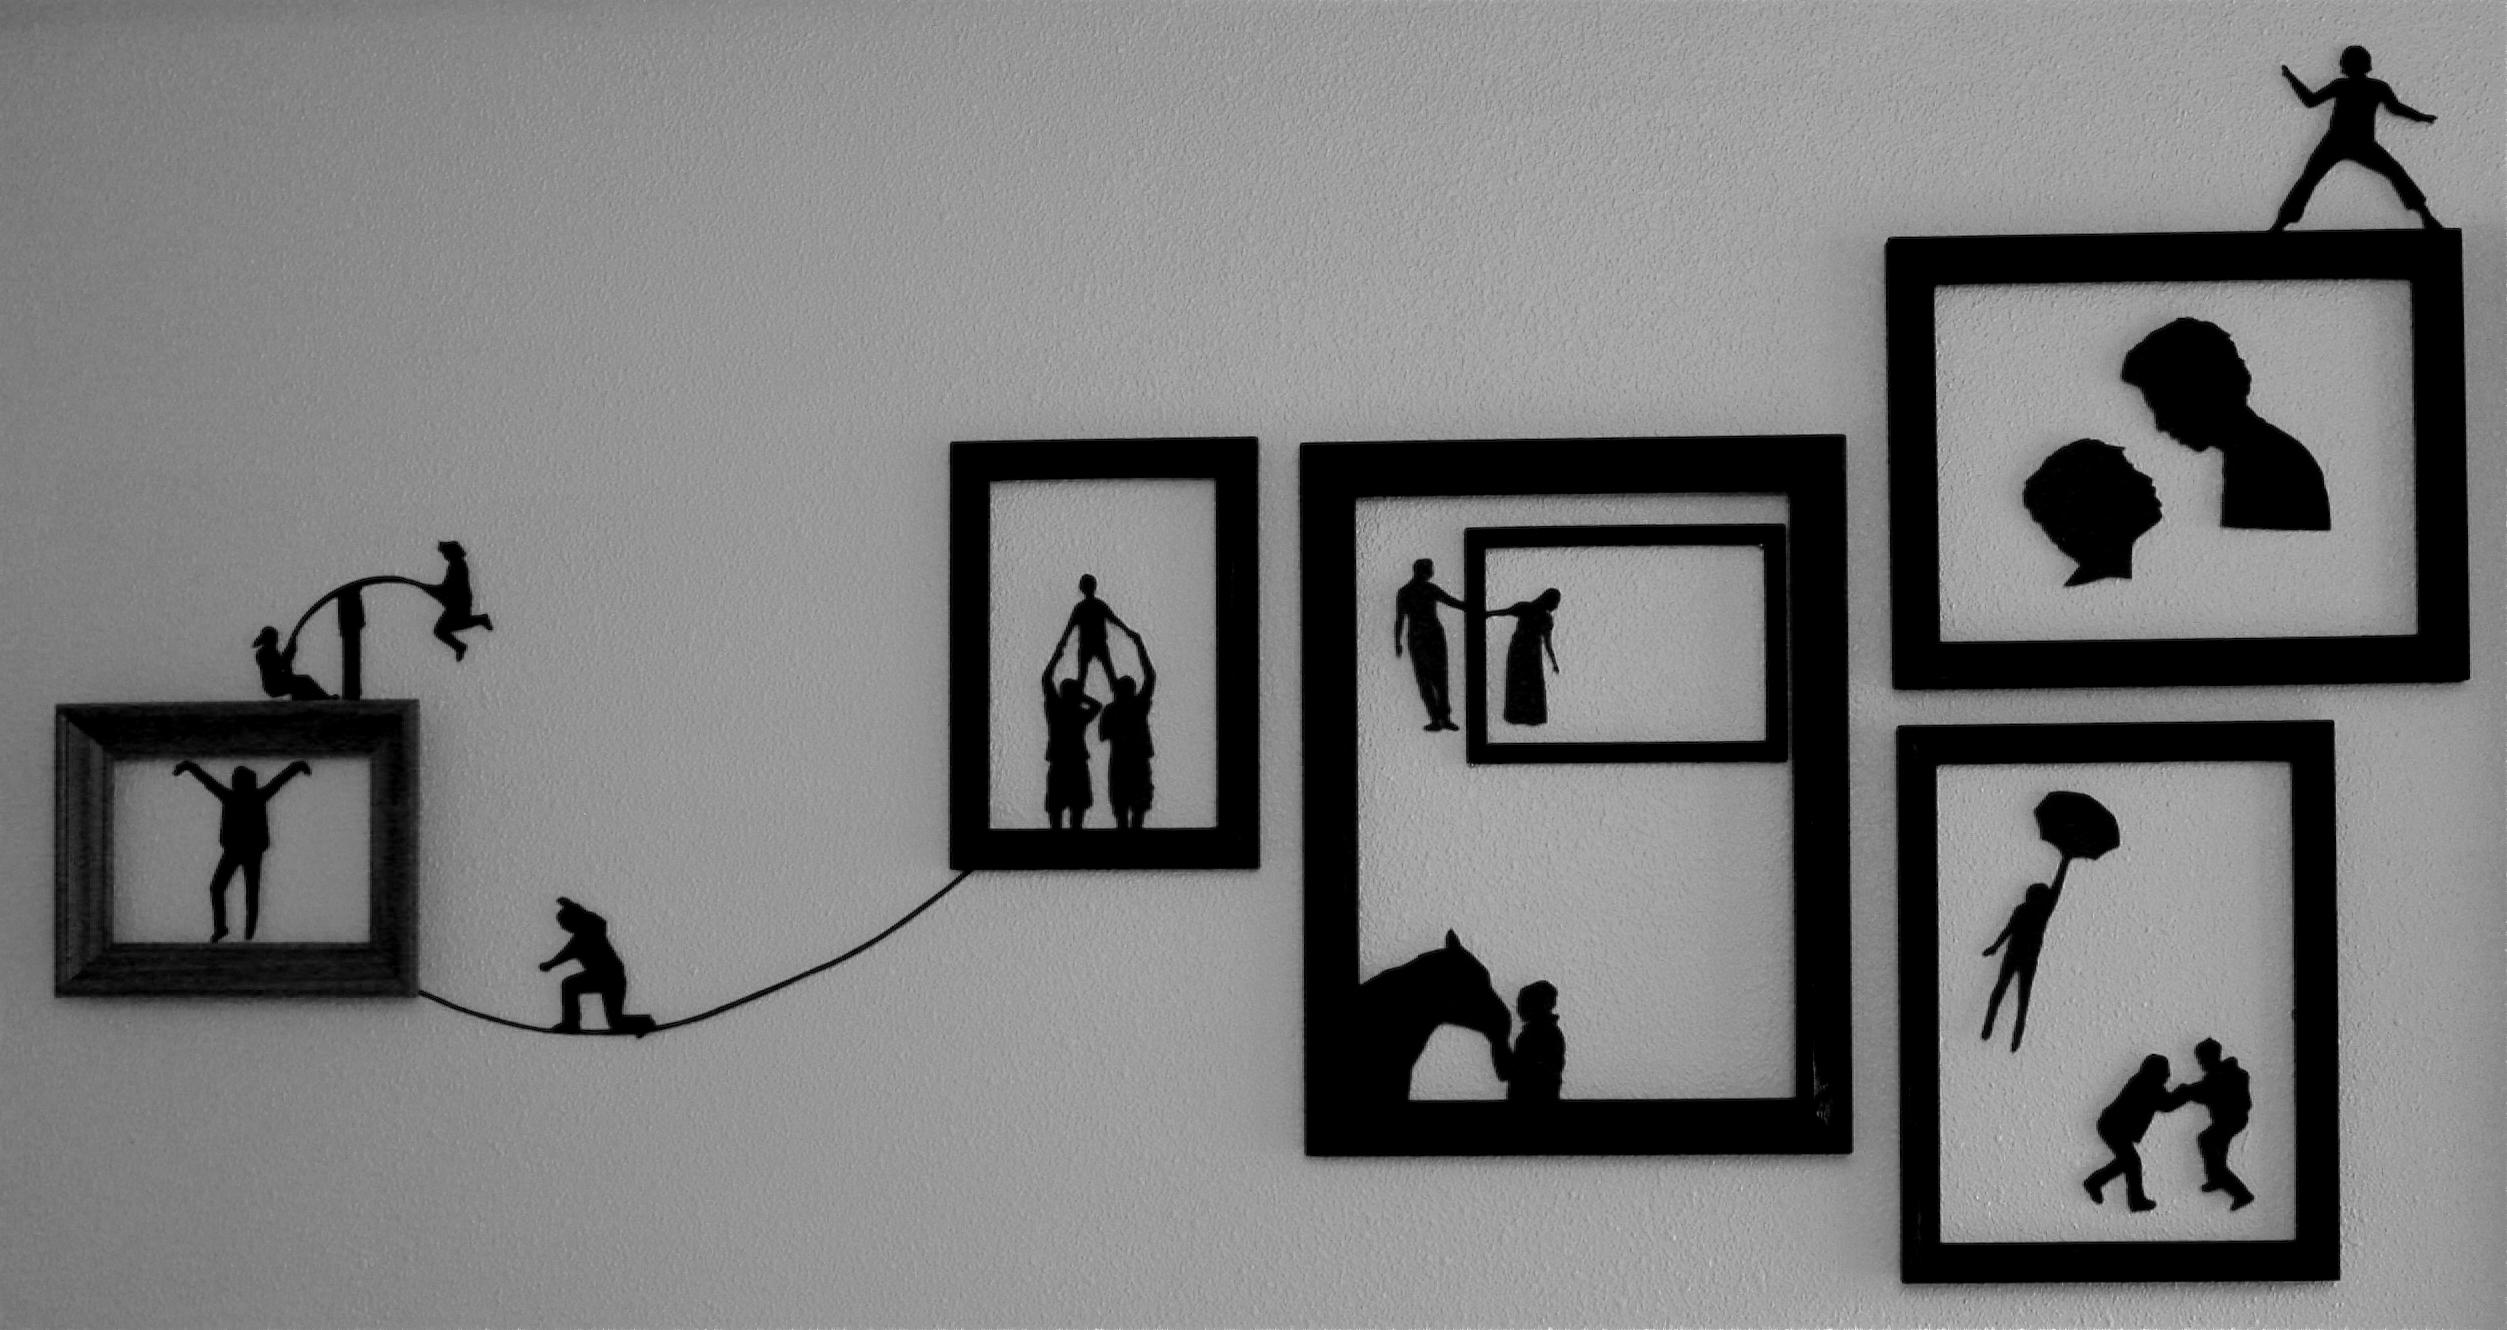 2017 Wall Art Decor: Incredible Ideas Foam Wall Art Story Telling From With Styrofoam Wall Art (Gallery 10 of 15)